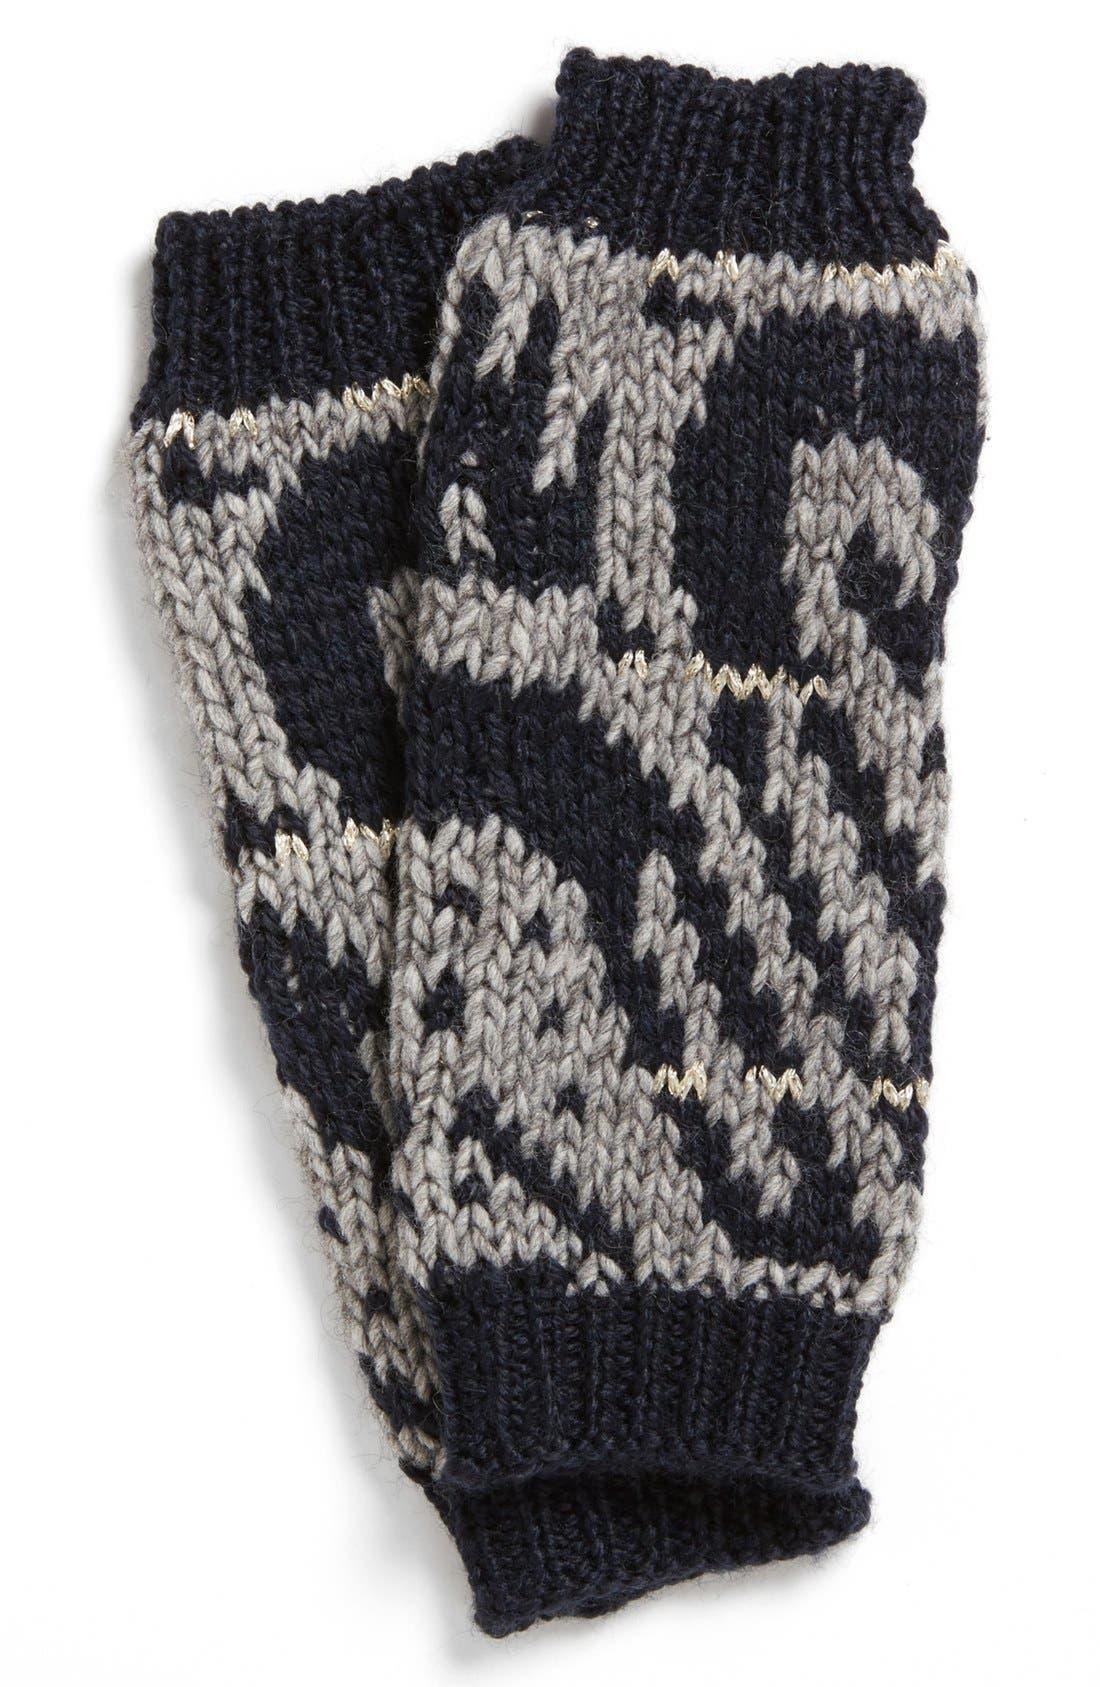 Alternate Image 1 Selected - Nordstrom 'Brocade' Intarsia Knit Fingerless Gloves